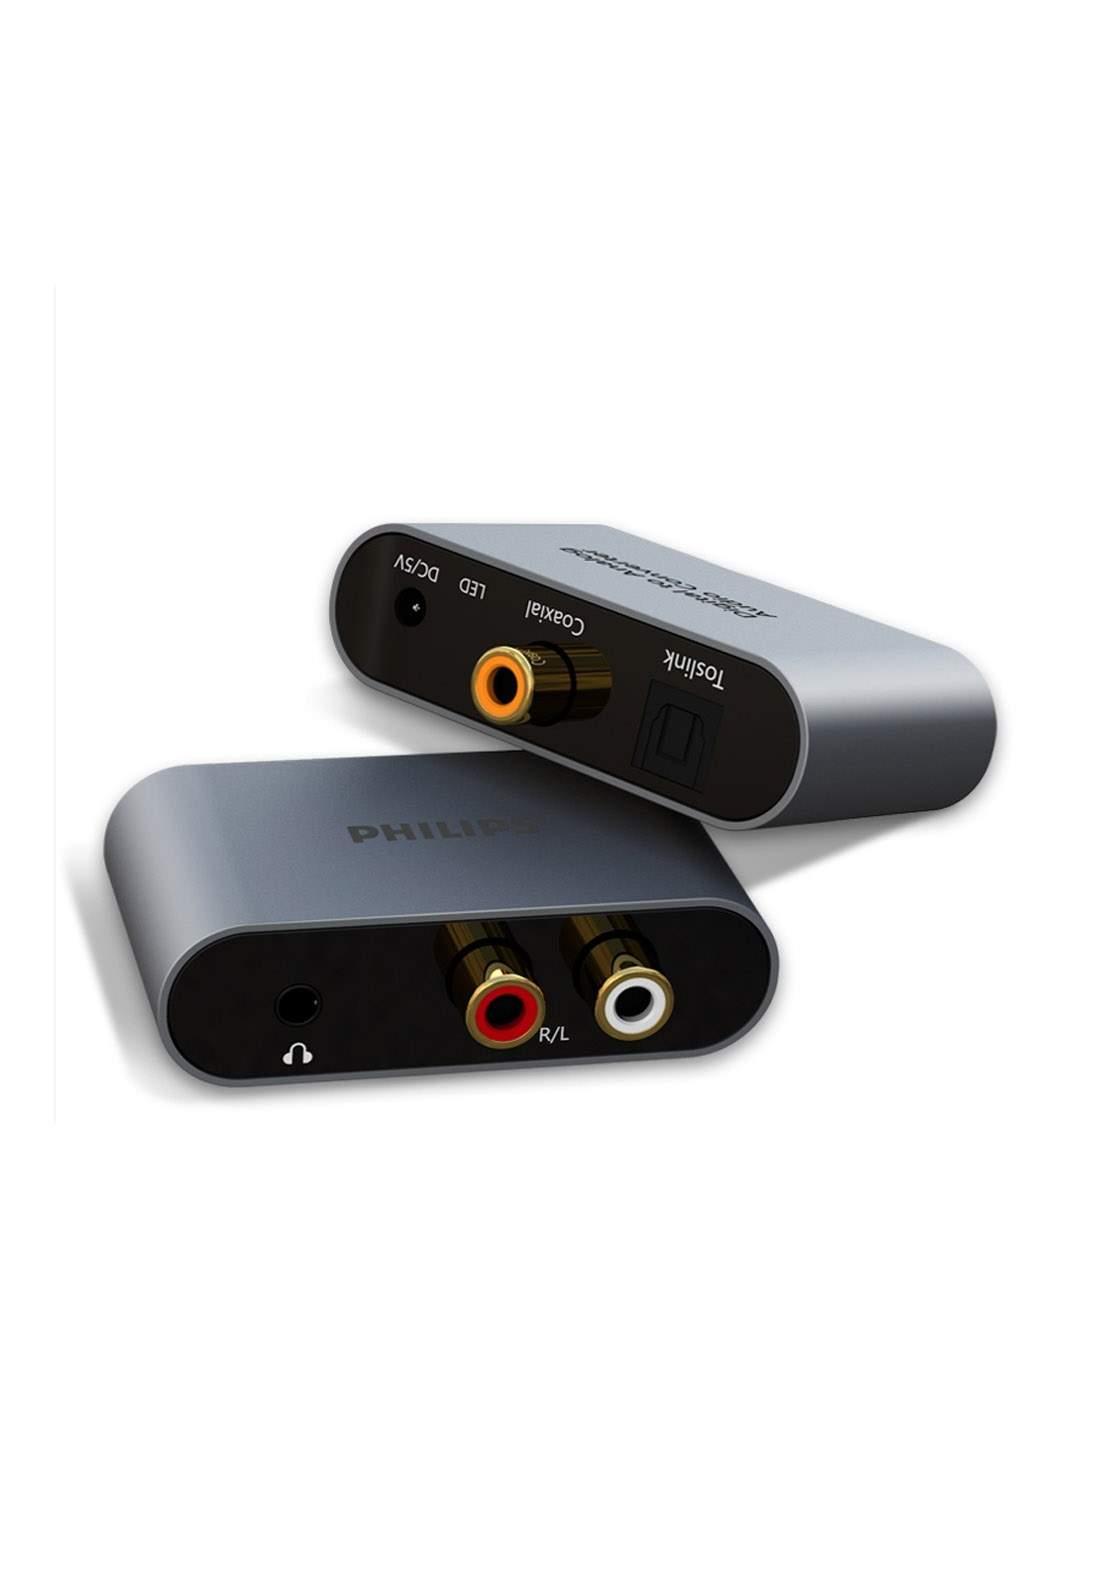 Philips SWR2123X/93 Digital to Analog Converter - Gray محول